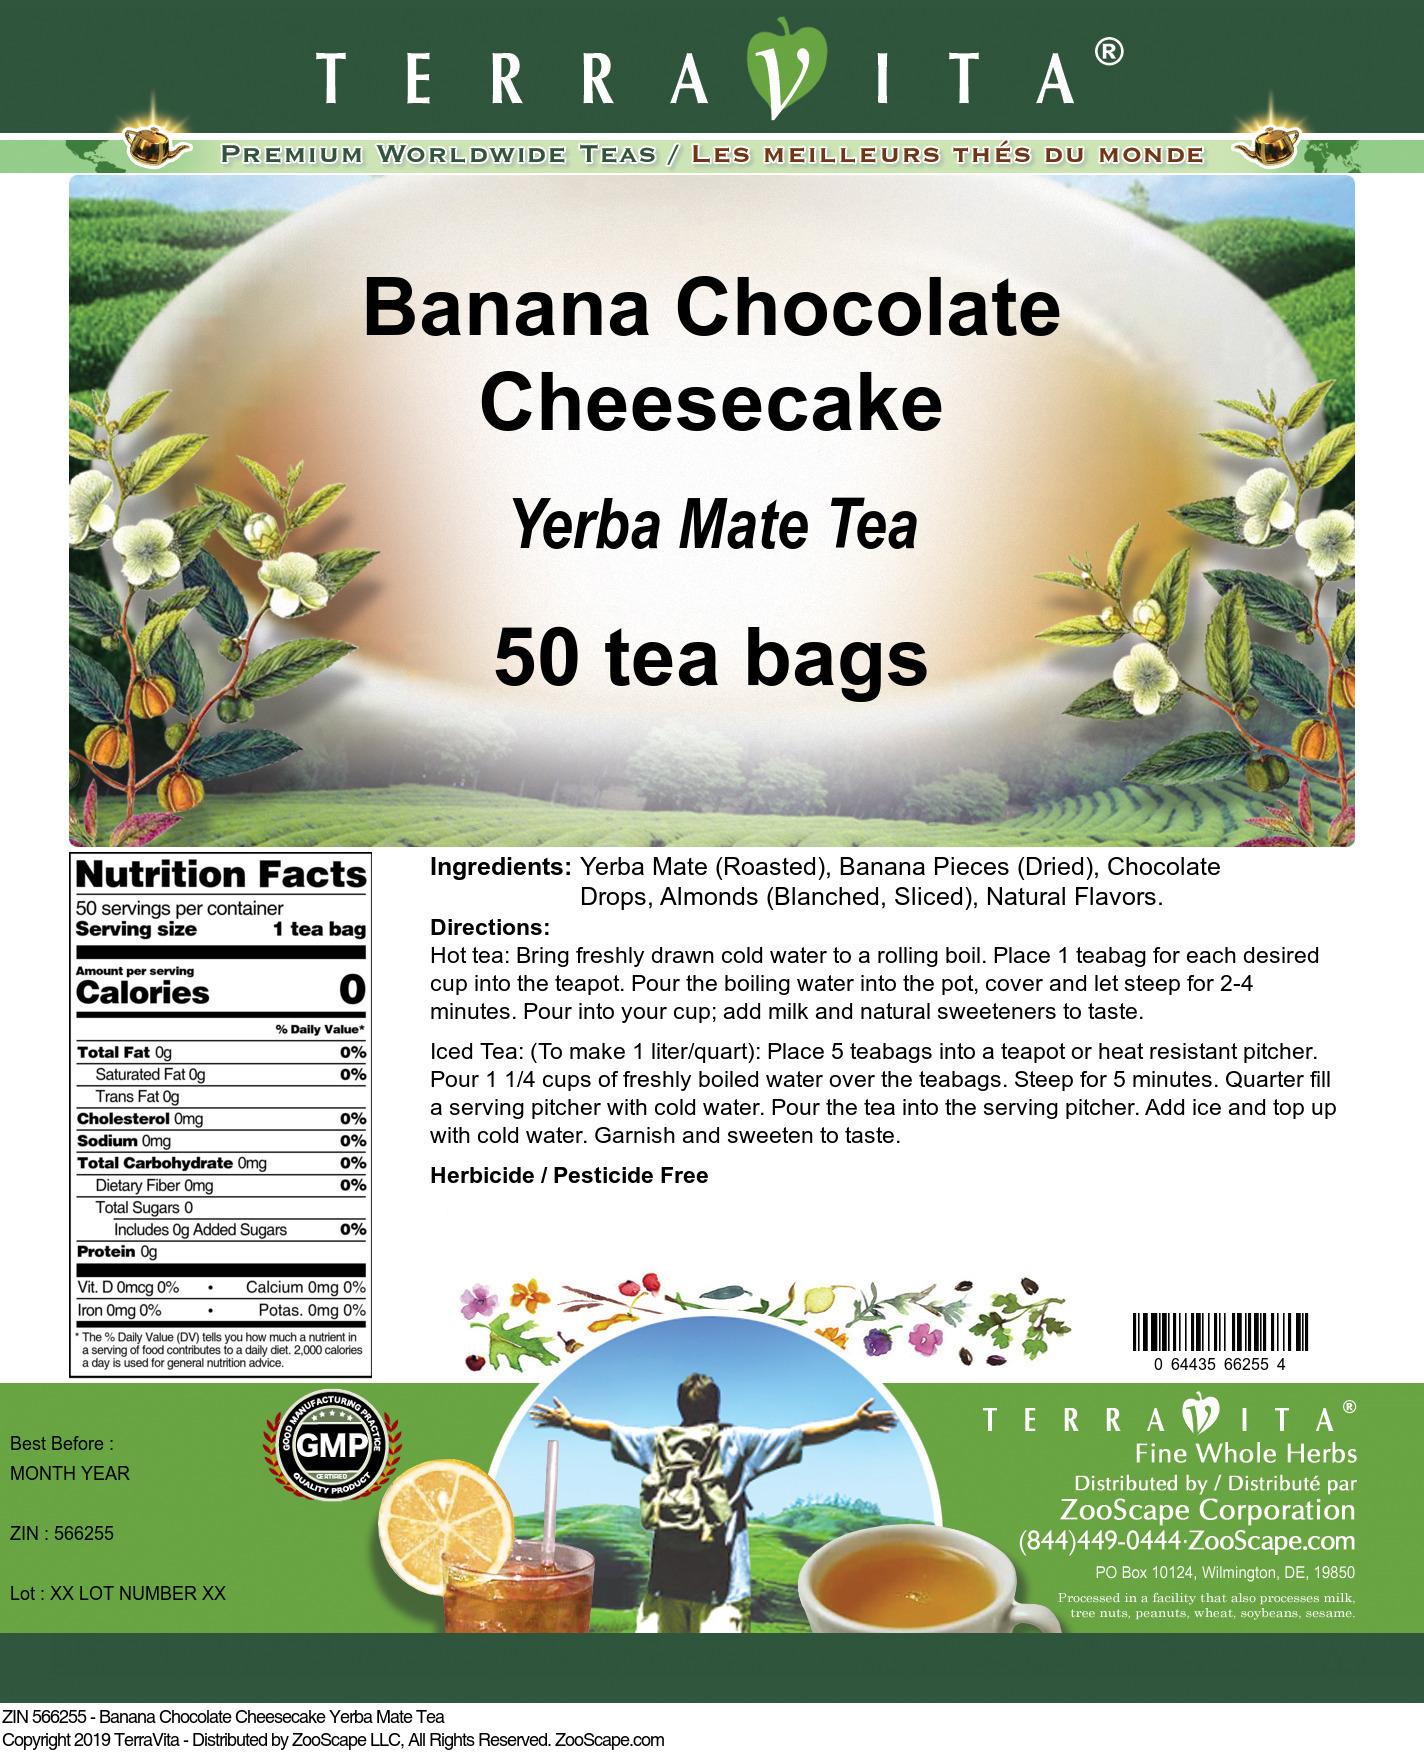 Banana Chocolate Cheesecake Yerba Mate Tea